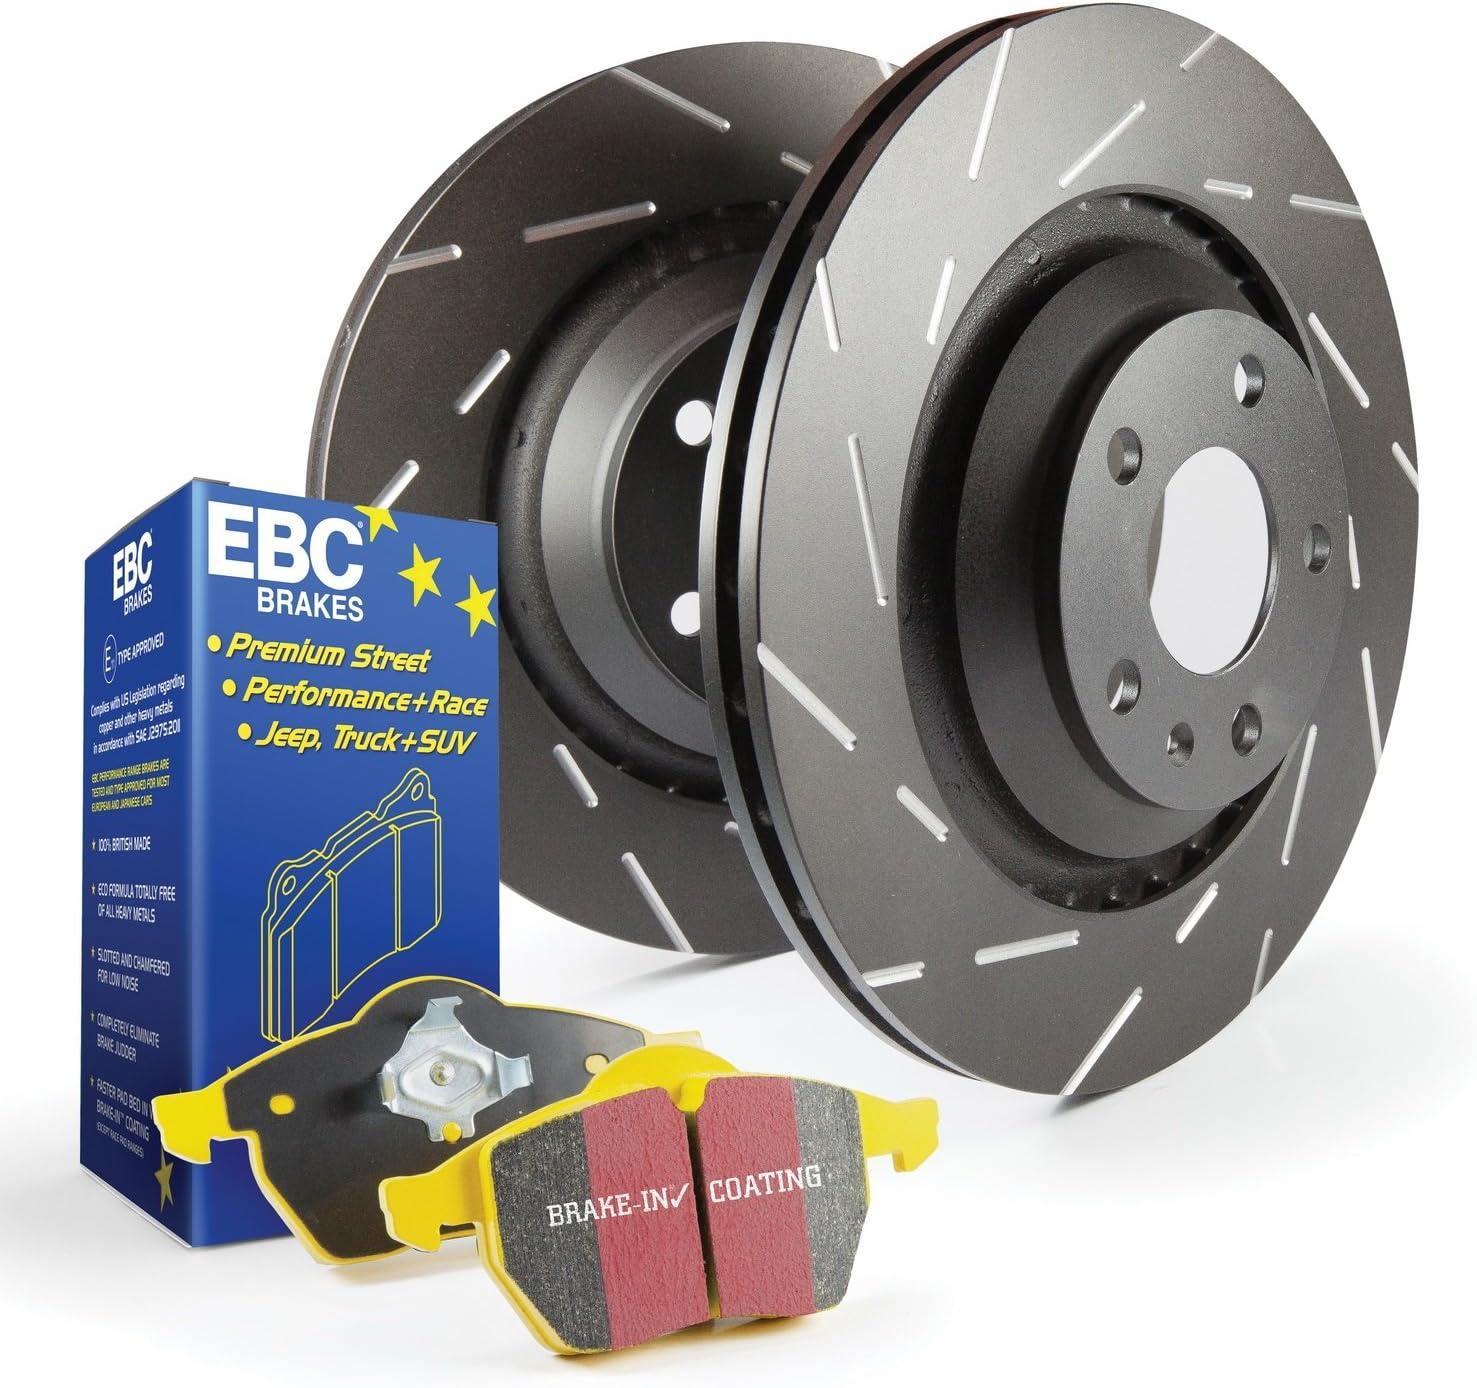 S9KR1455 EBC Brakes S9 Rear Kits Yellowstuff and USR Rotors